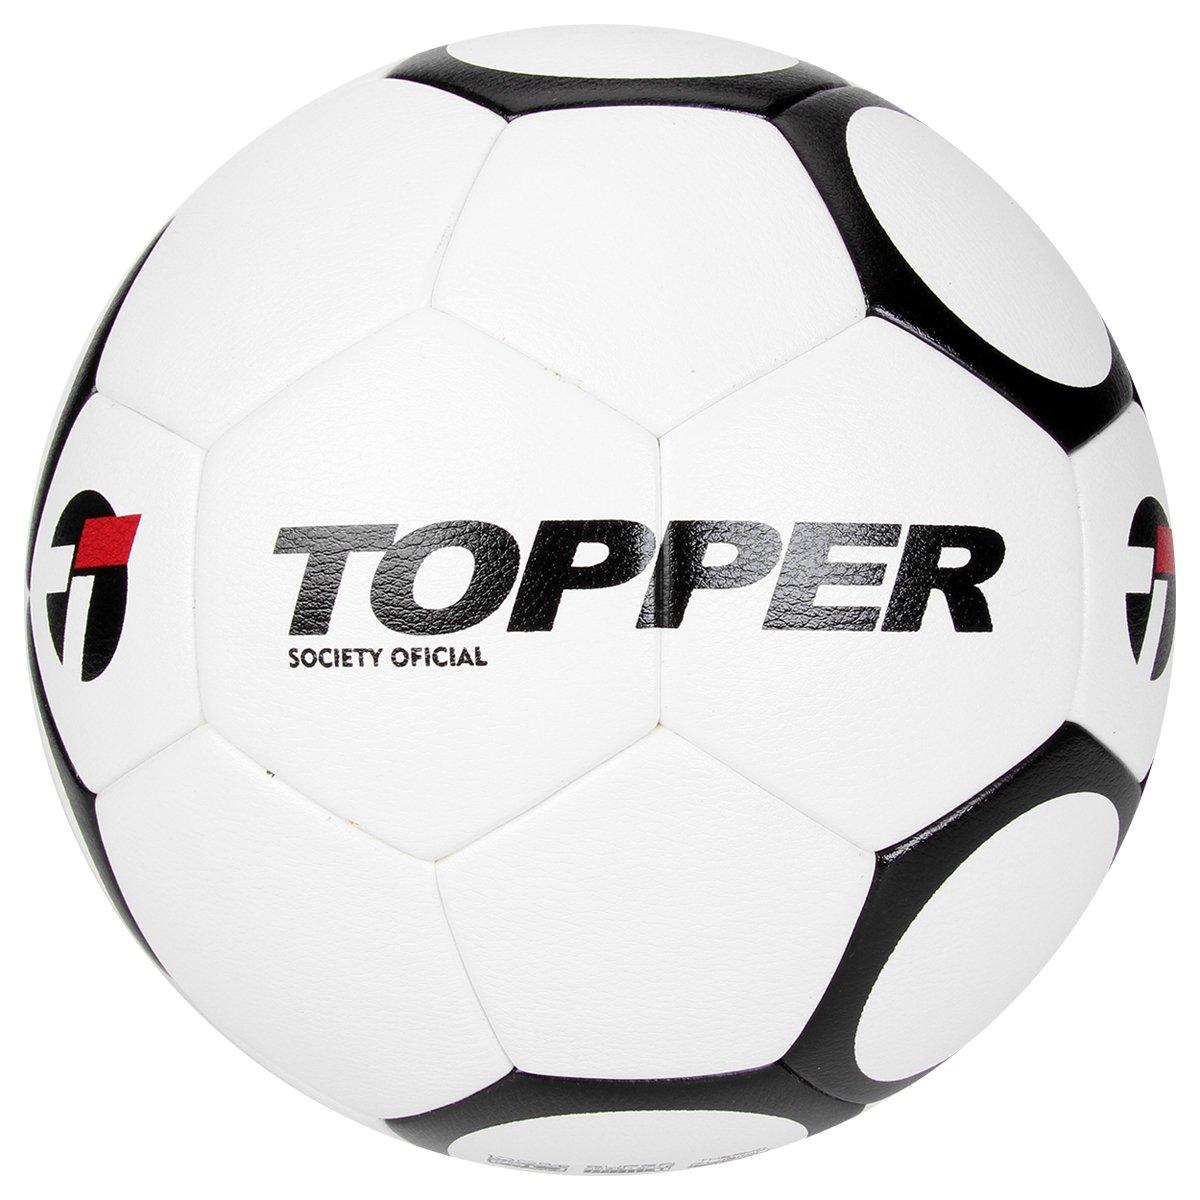 98206f8812a2c Bola Futebol Topper 90S Society - Compre Agora